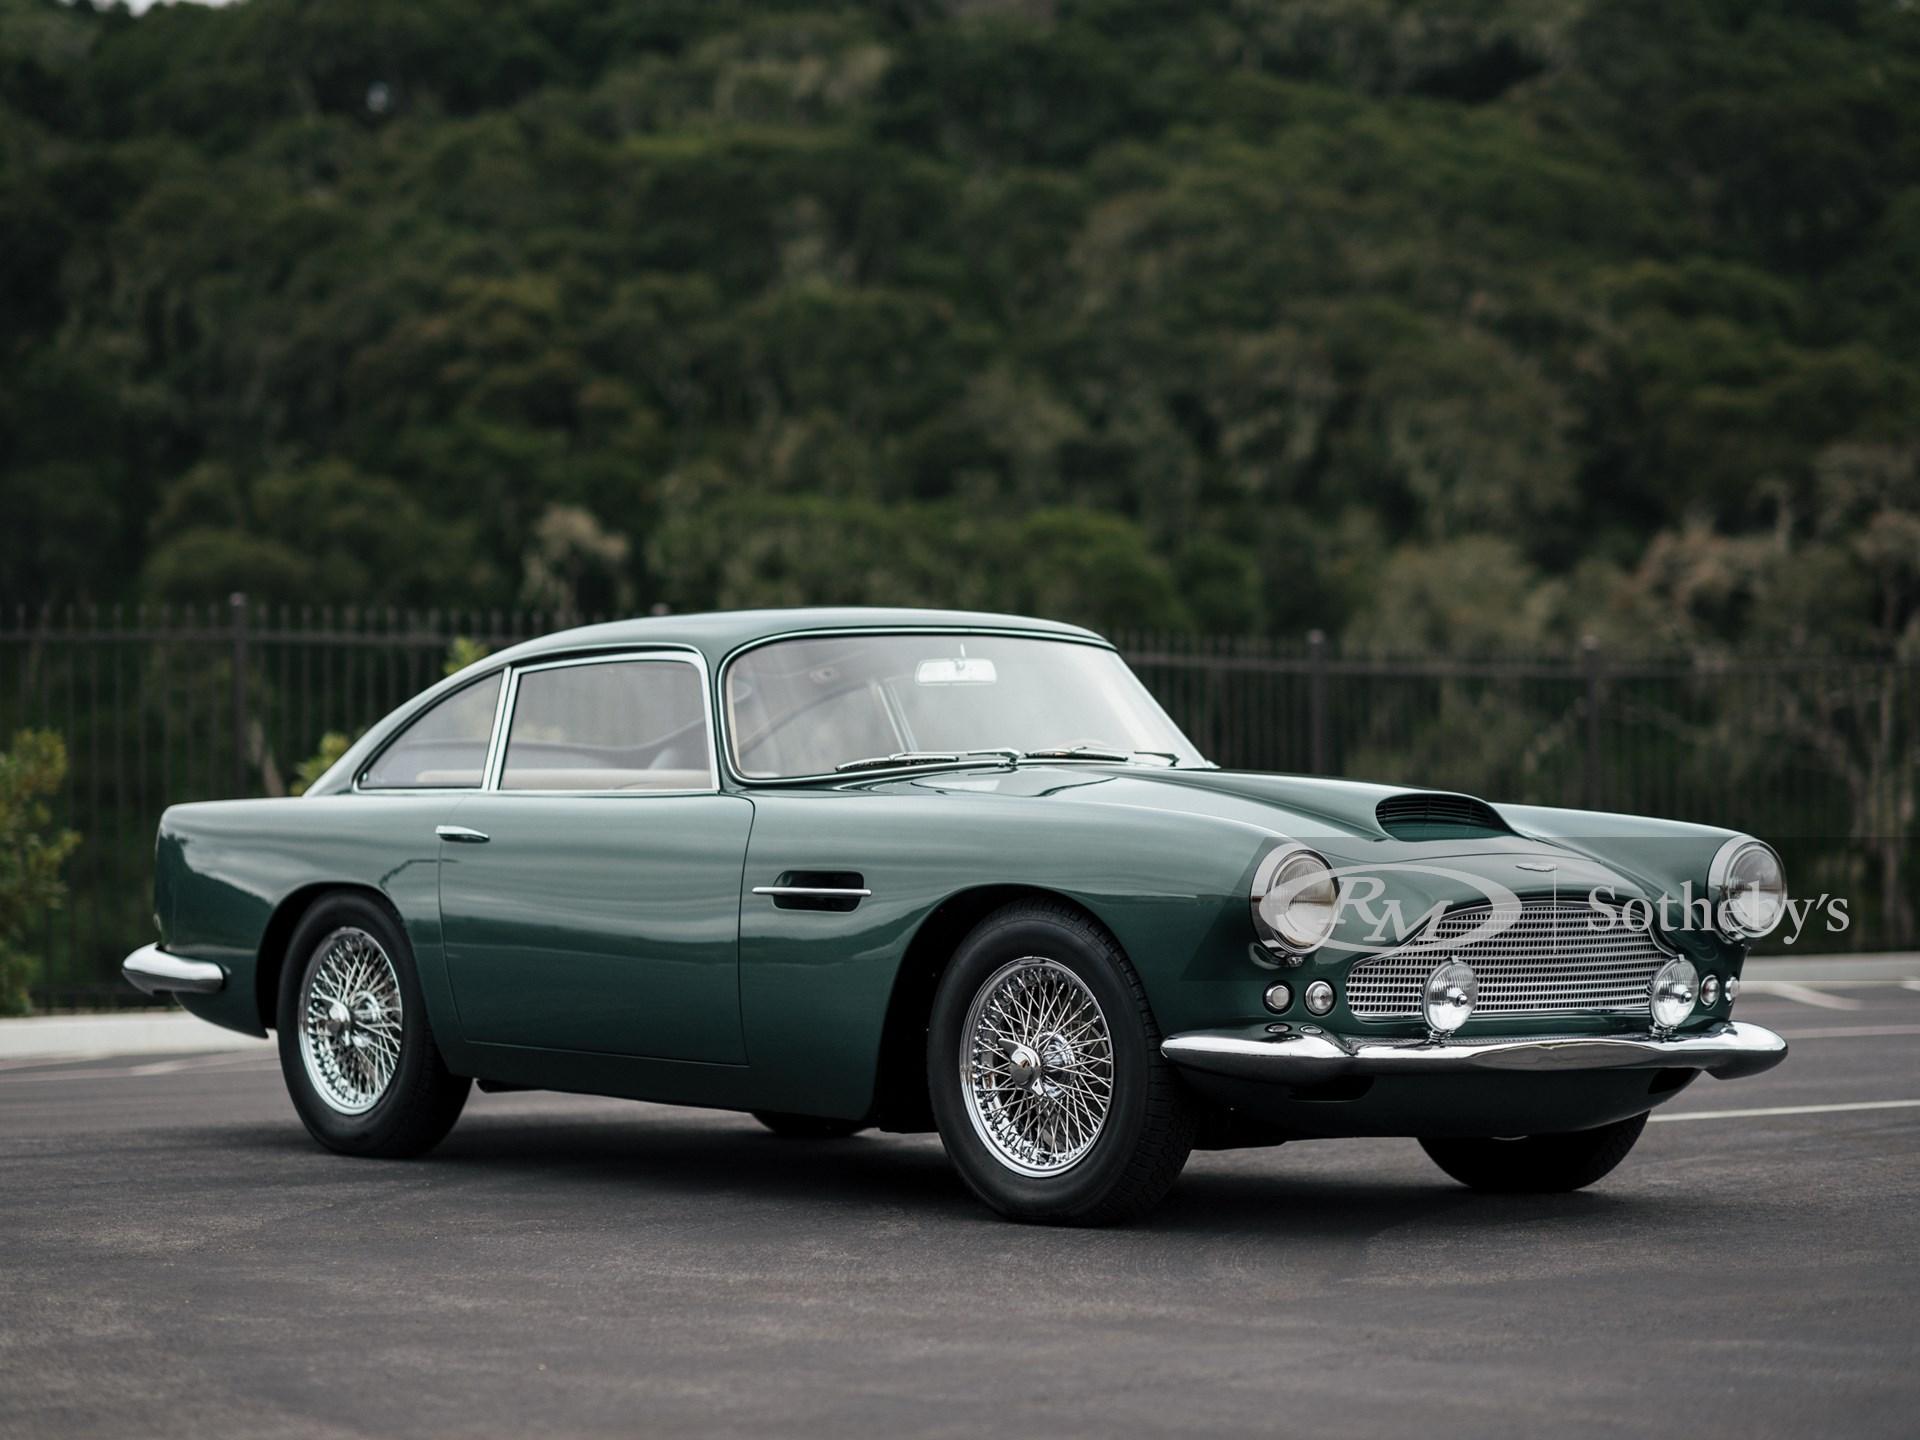 1961 Aston Martin Db4 Series Ii Monterey 2019 Rm Sotheby S